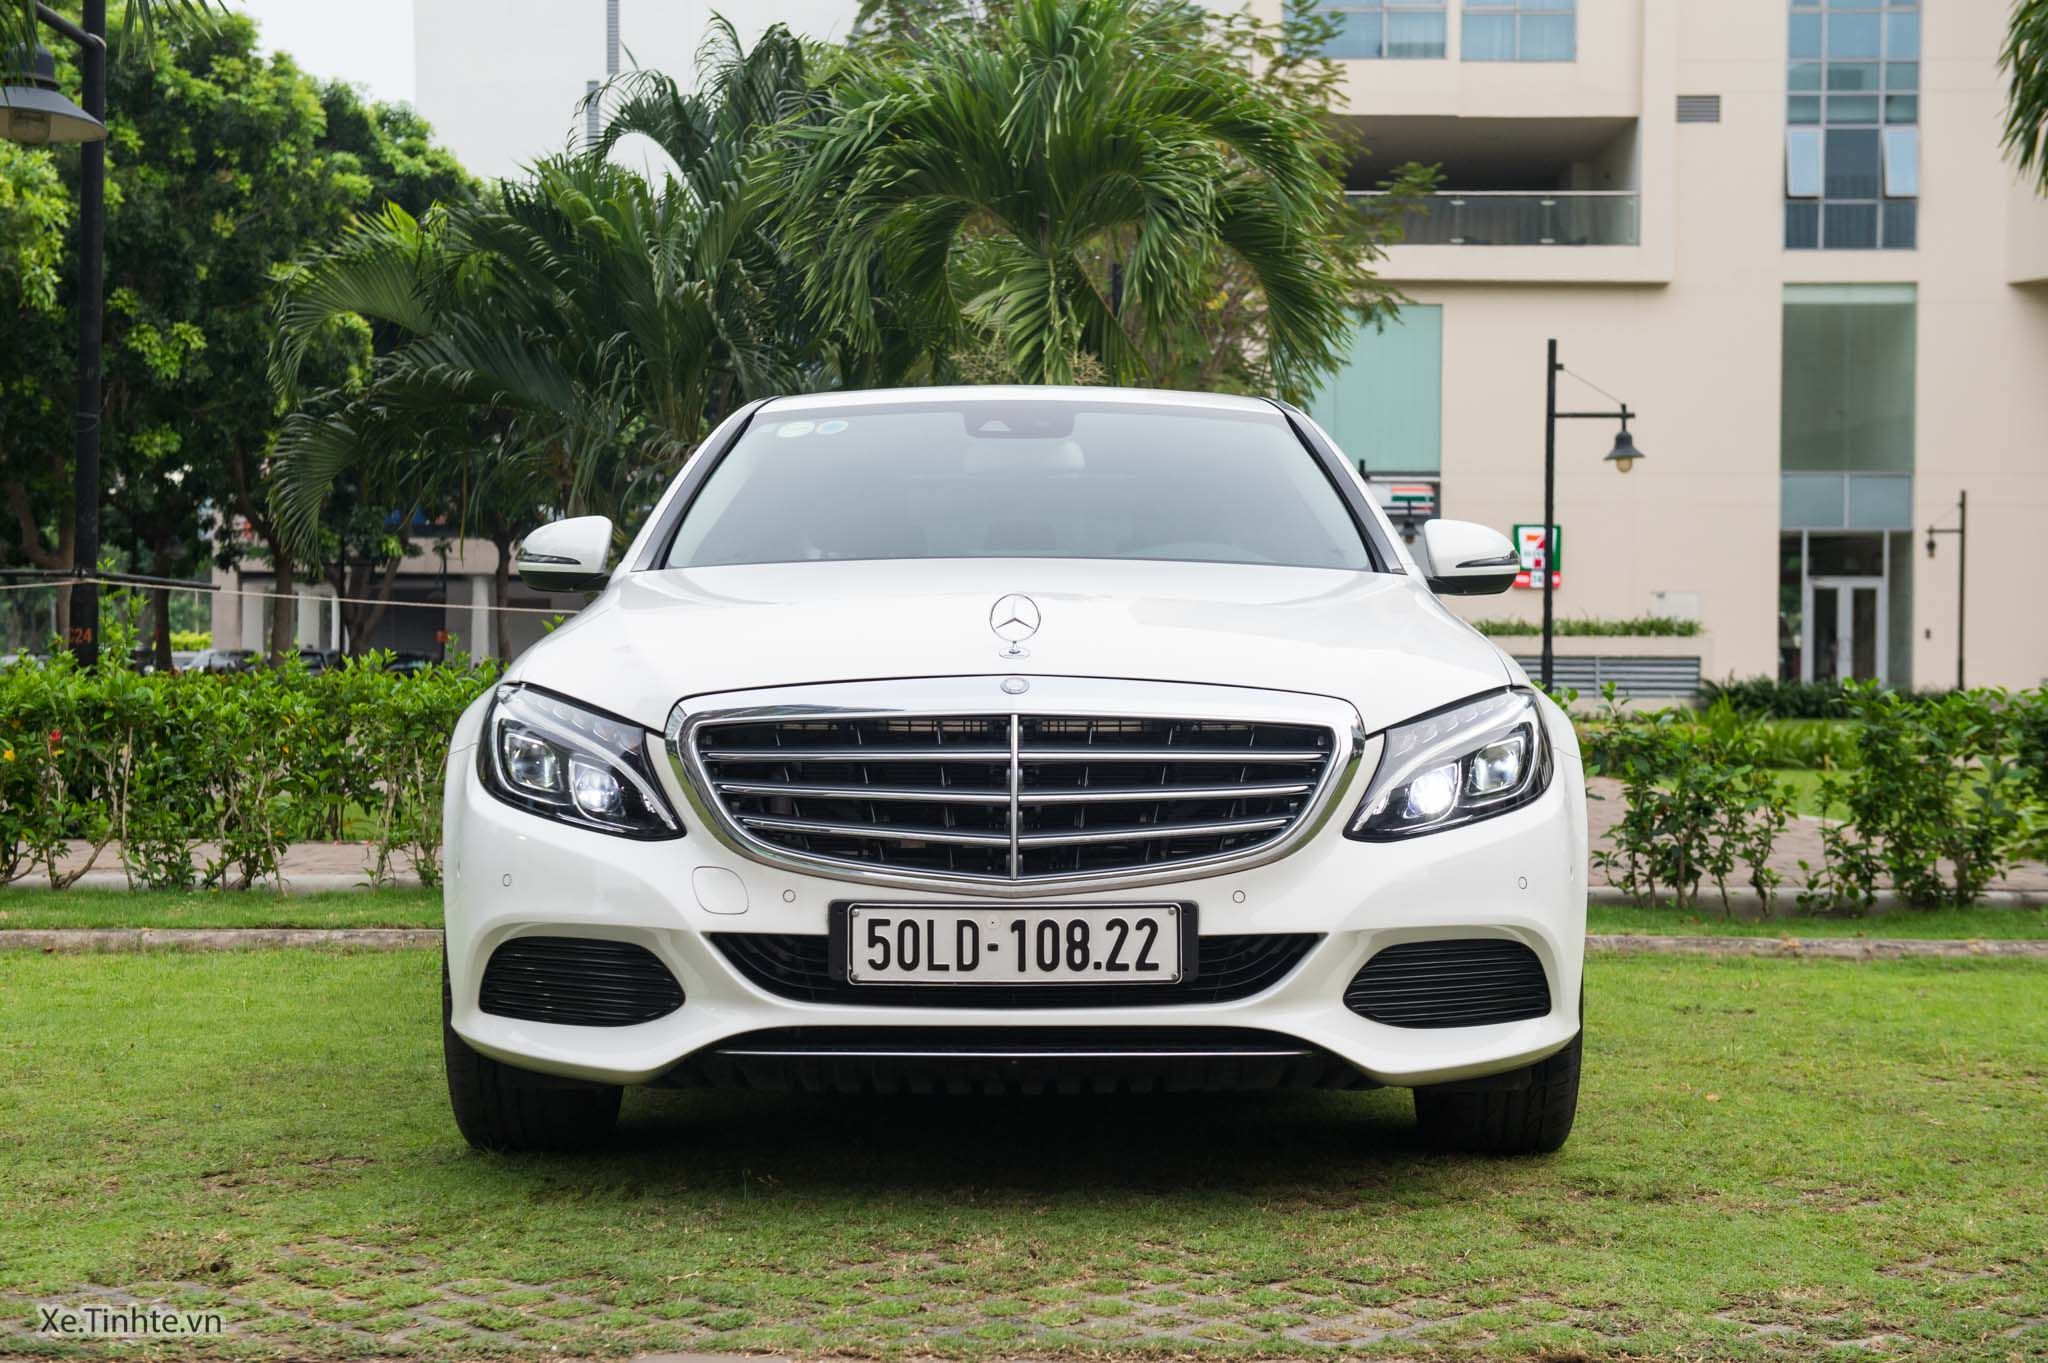 Mercedes_C250 Exclusive_Xe.tinhte.vn-7292.jpg